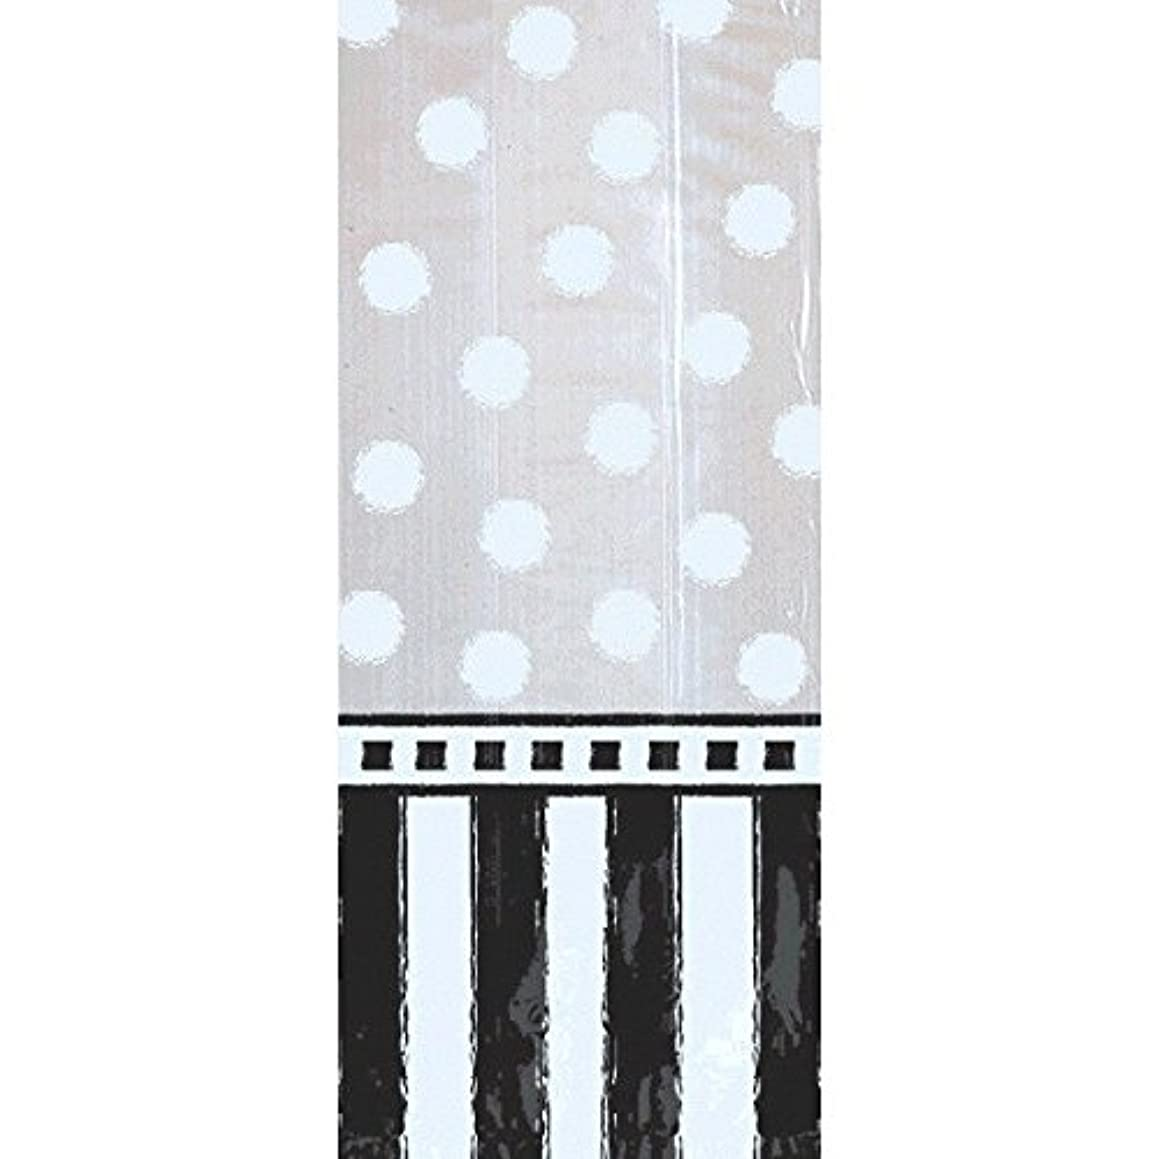 Amscan 370245 Fancy Black & White Black and White Cello Bags, 9 1/2